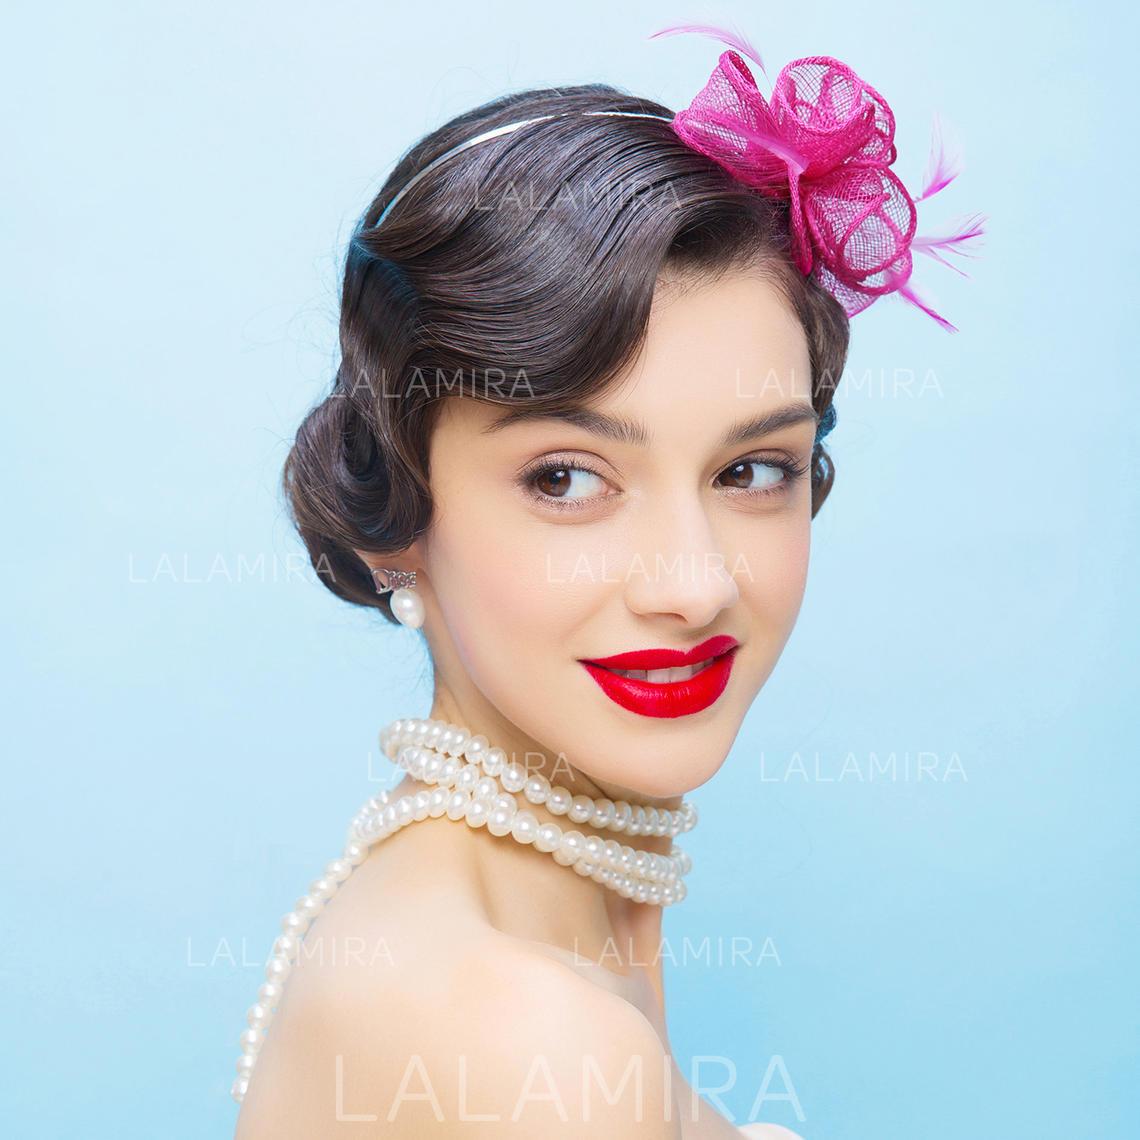 be42fa9e6e5b7 Net Yarn With Feather Fascinators Beautiful Ladies' Hats (196194283).  Loading zoom